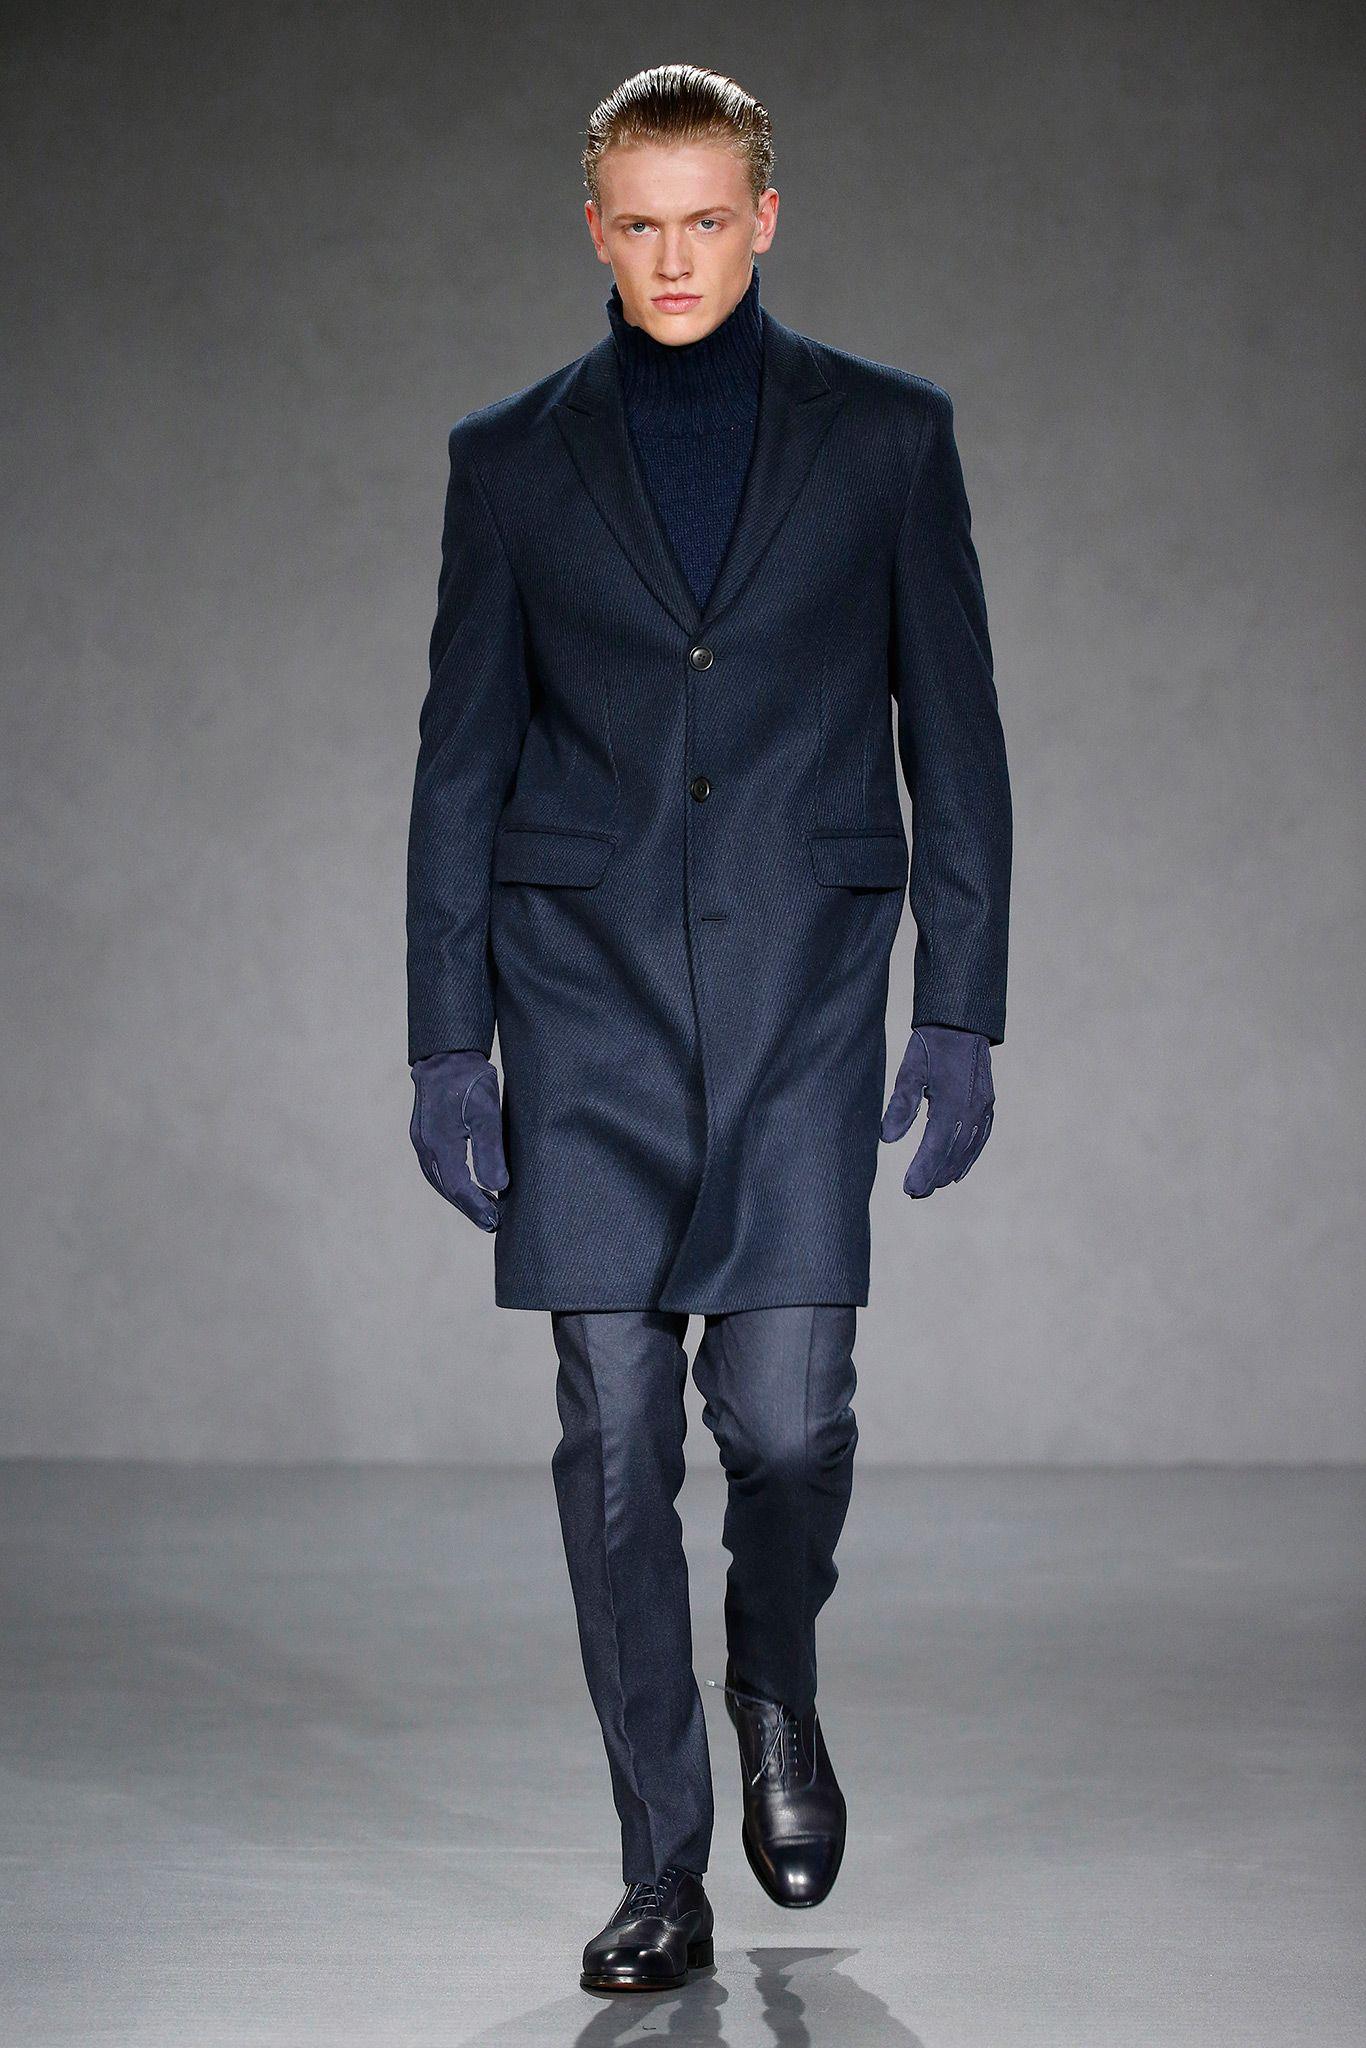 Gieves & Hawkes Fall 2015 Menswear